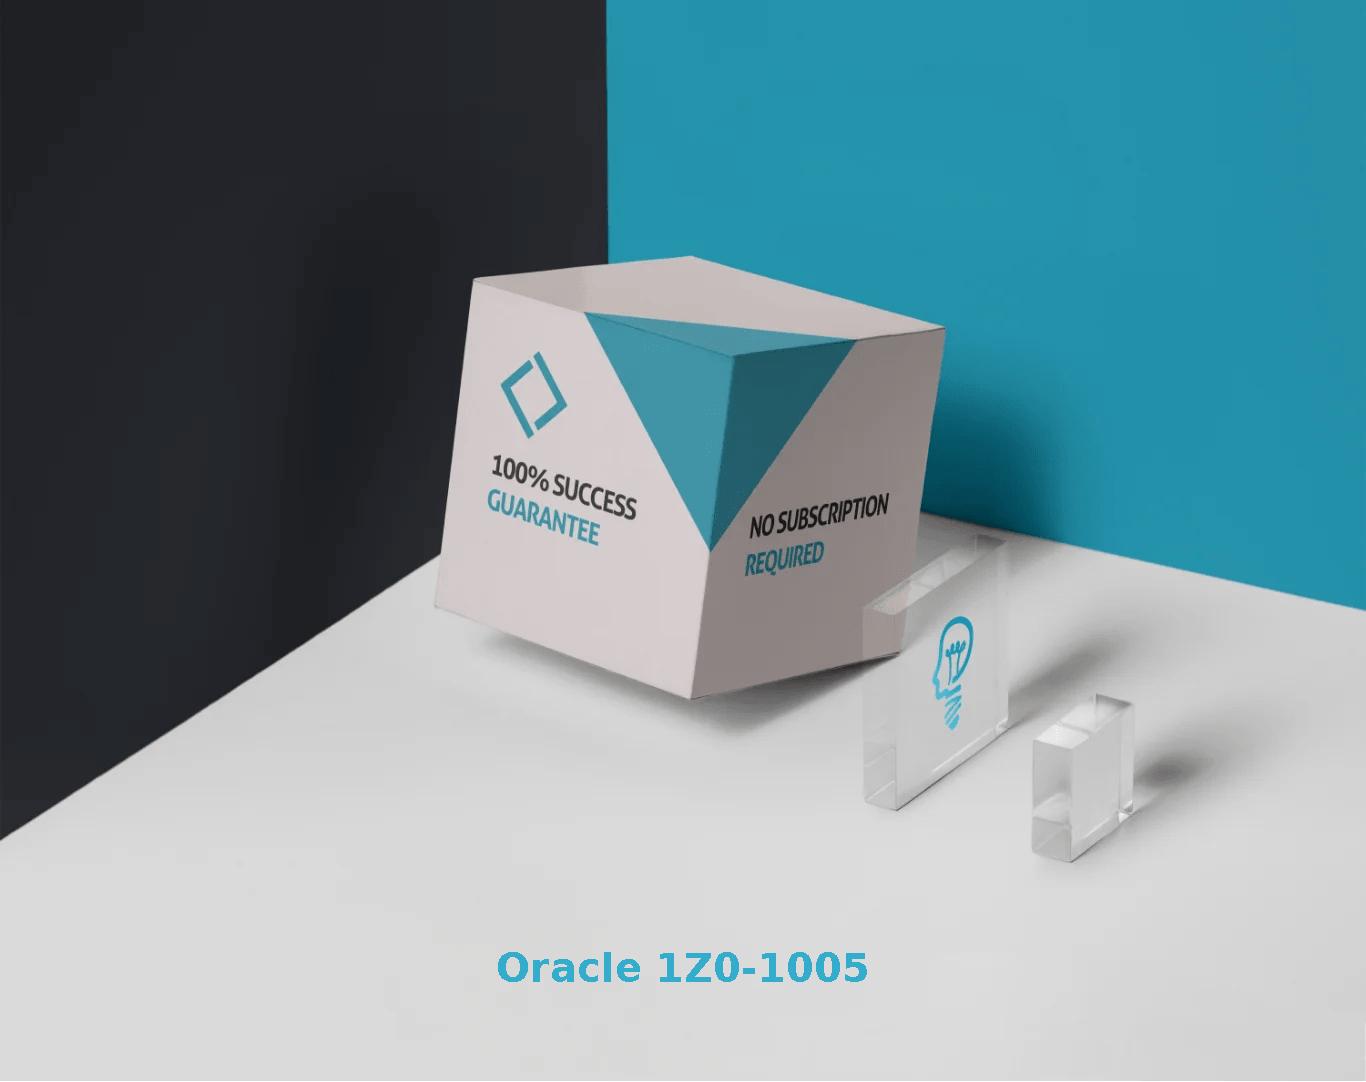 Oracle 1Z0-1005 Exams